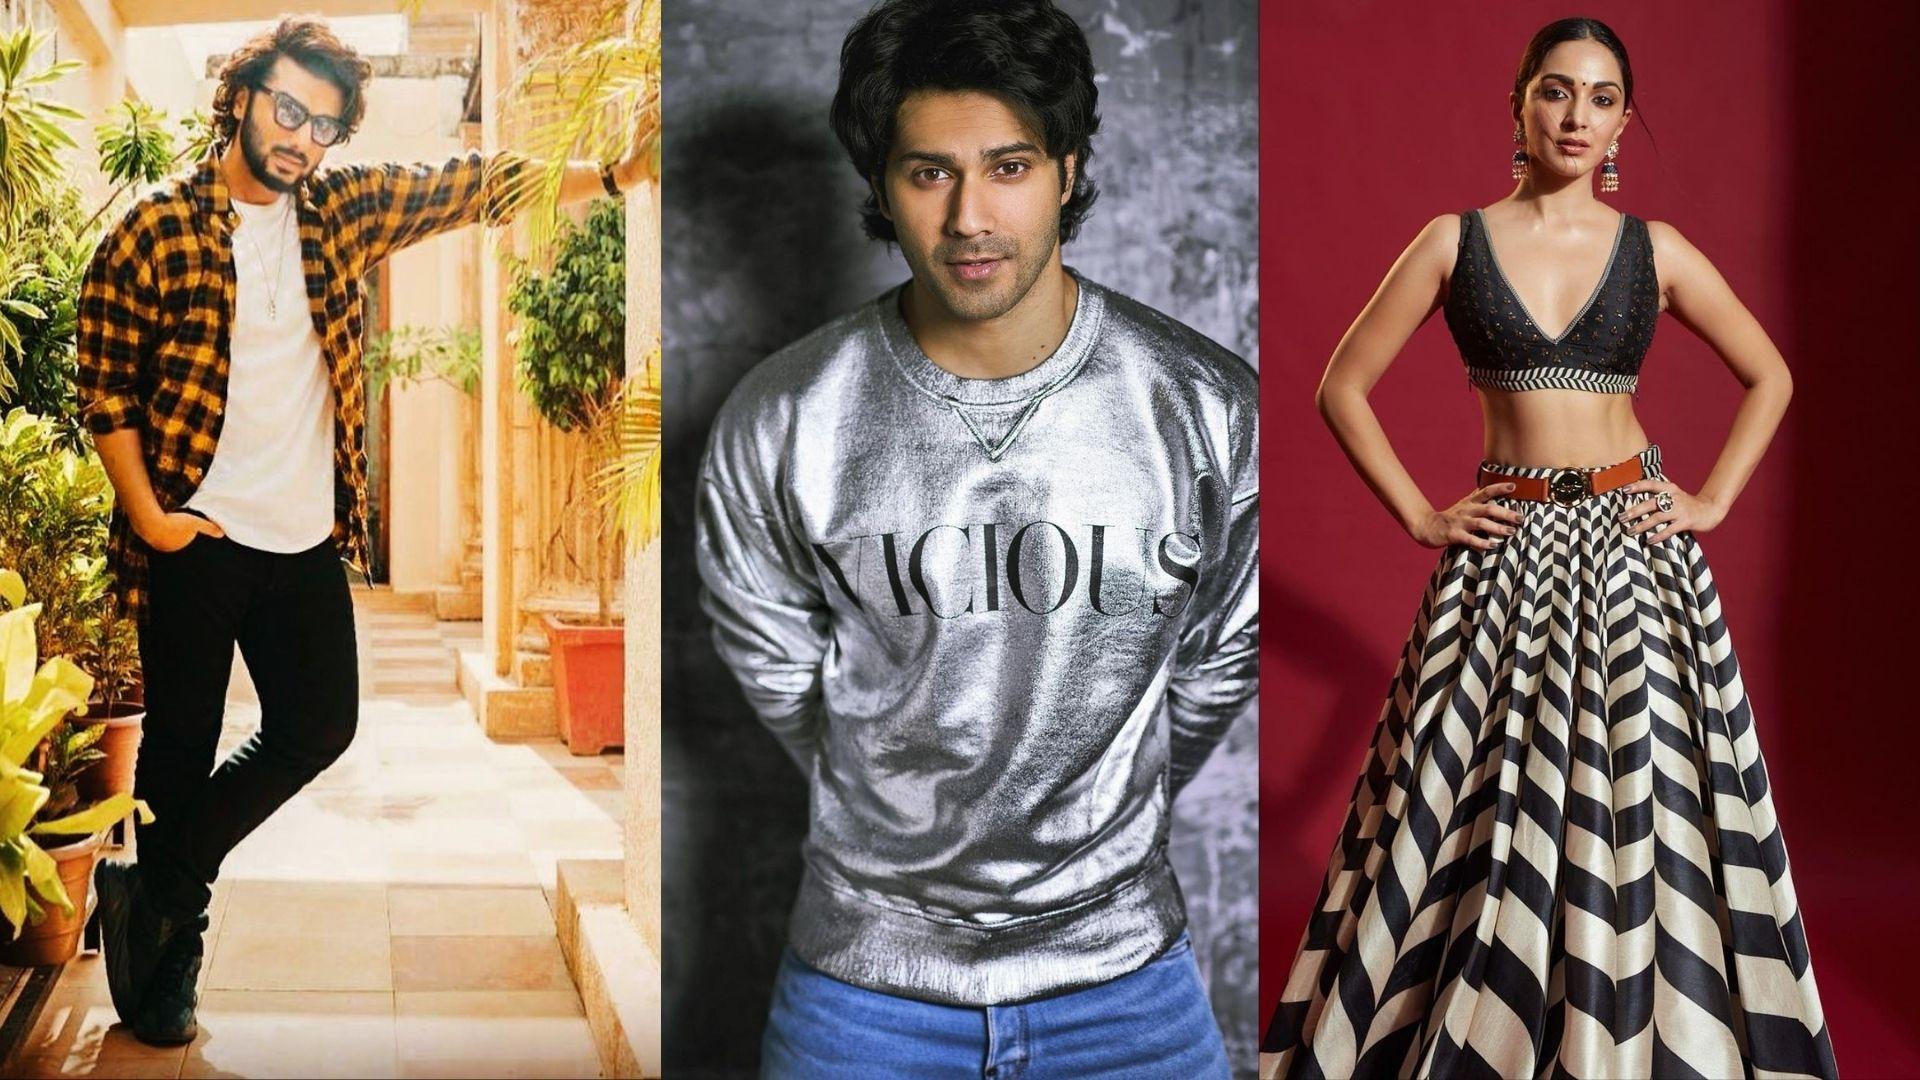 Arjun Kapoor And Kiara Advani's Comments On Varun Dhawan's 'Good Boy' Post Will Make You Go Gaga Over Their Bond